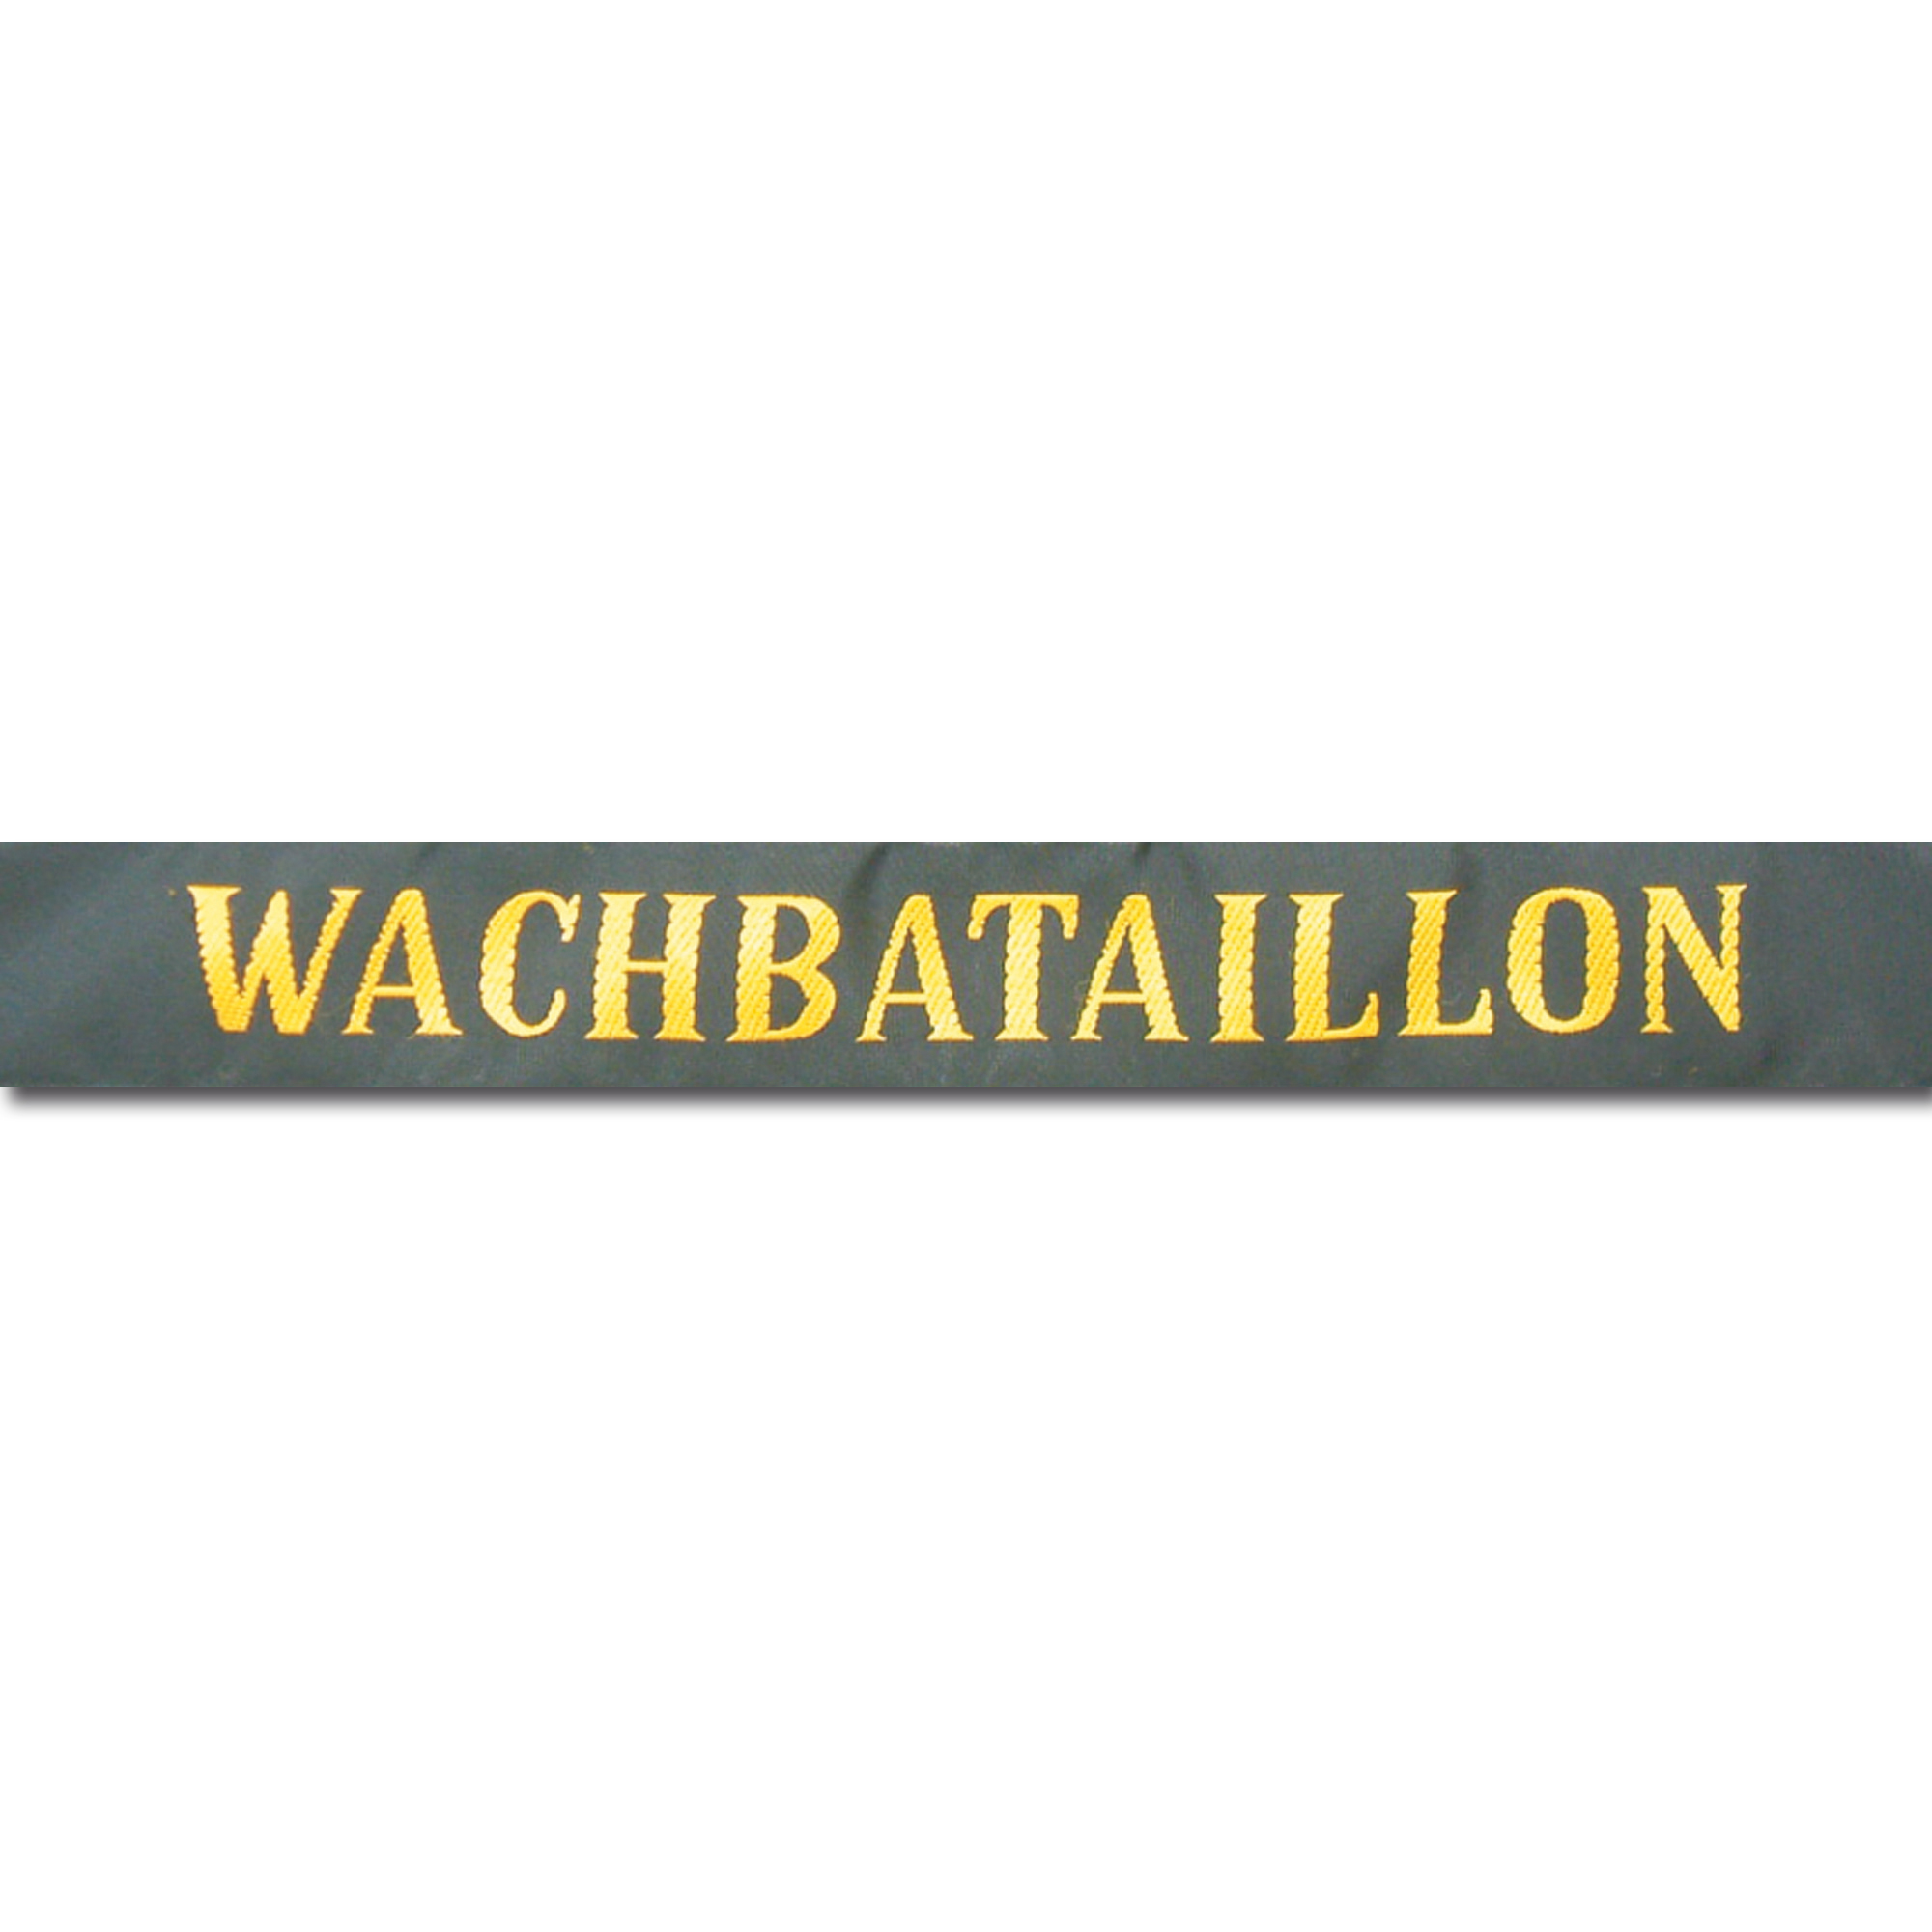 Mützenband Wachbataillon